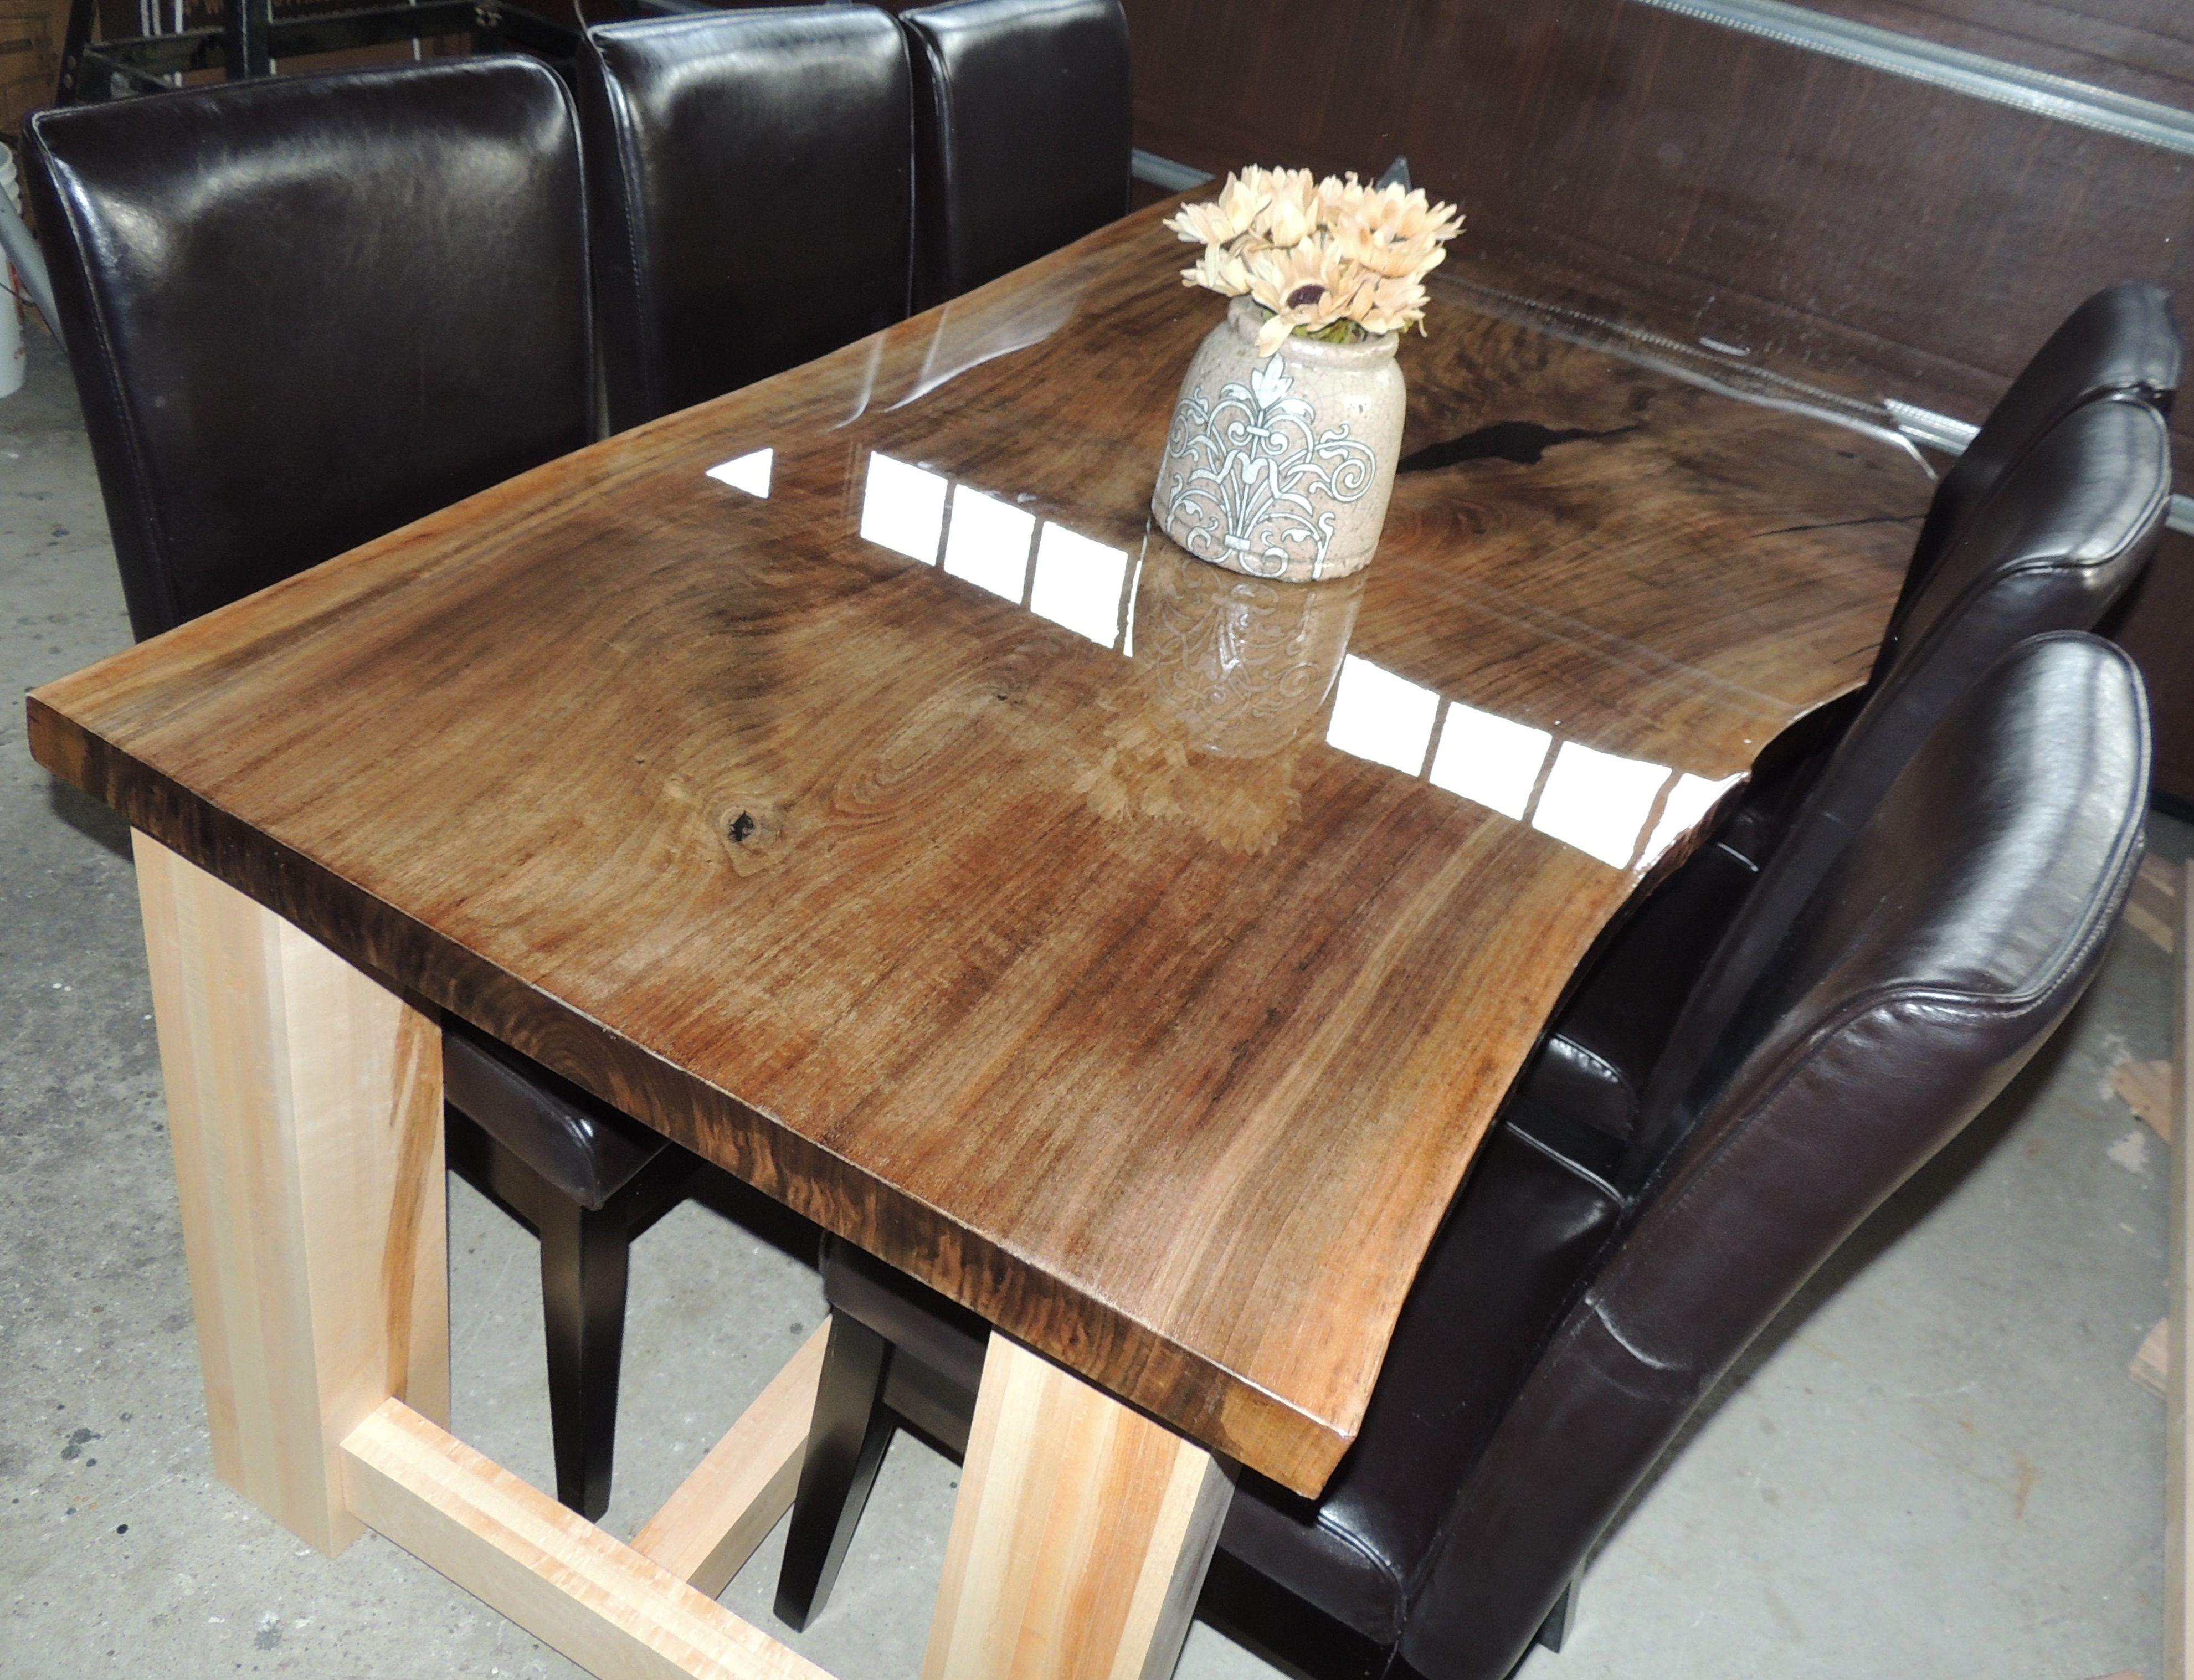 Black walnut live edge table with epoxy finish hunters for Finishing live edge wood